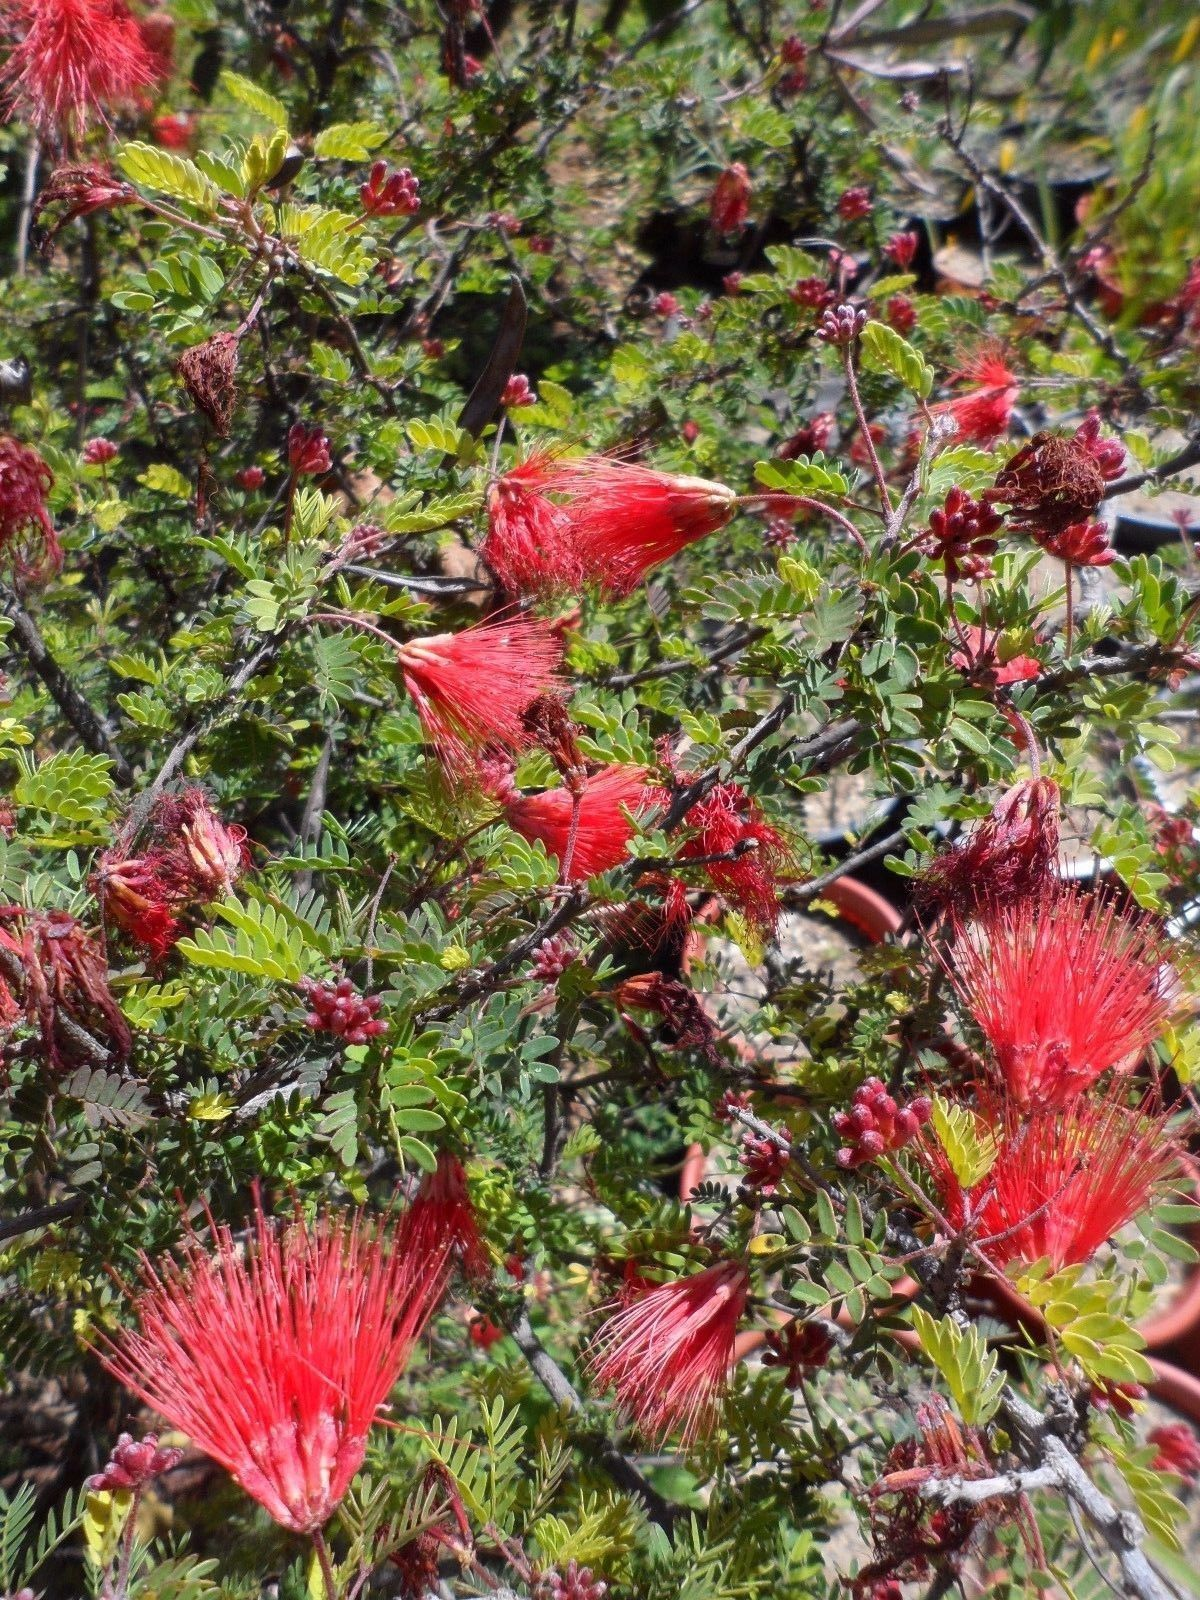 Calliandra californica, 1 PACK OF SEEDS (10 seeds) eBay